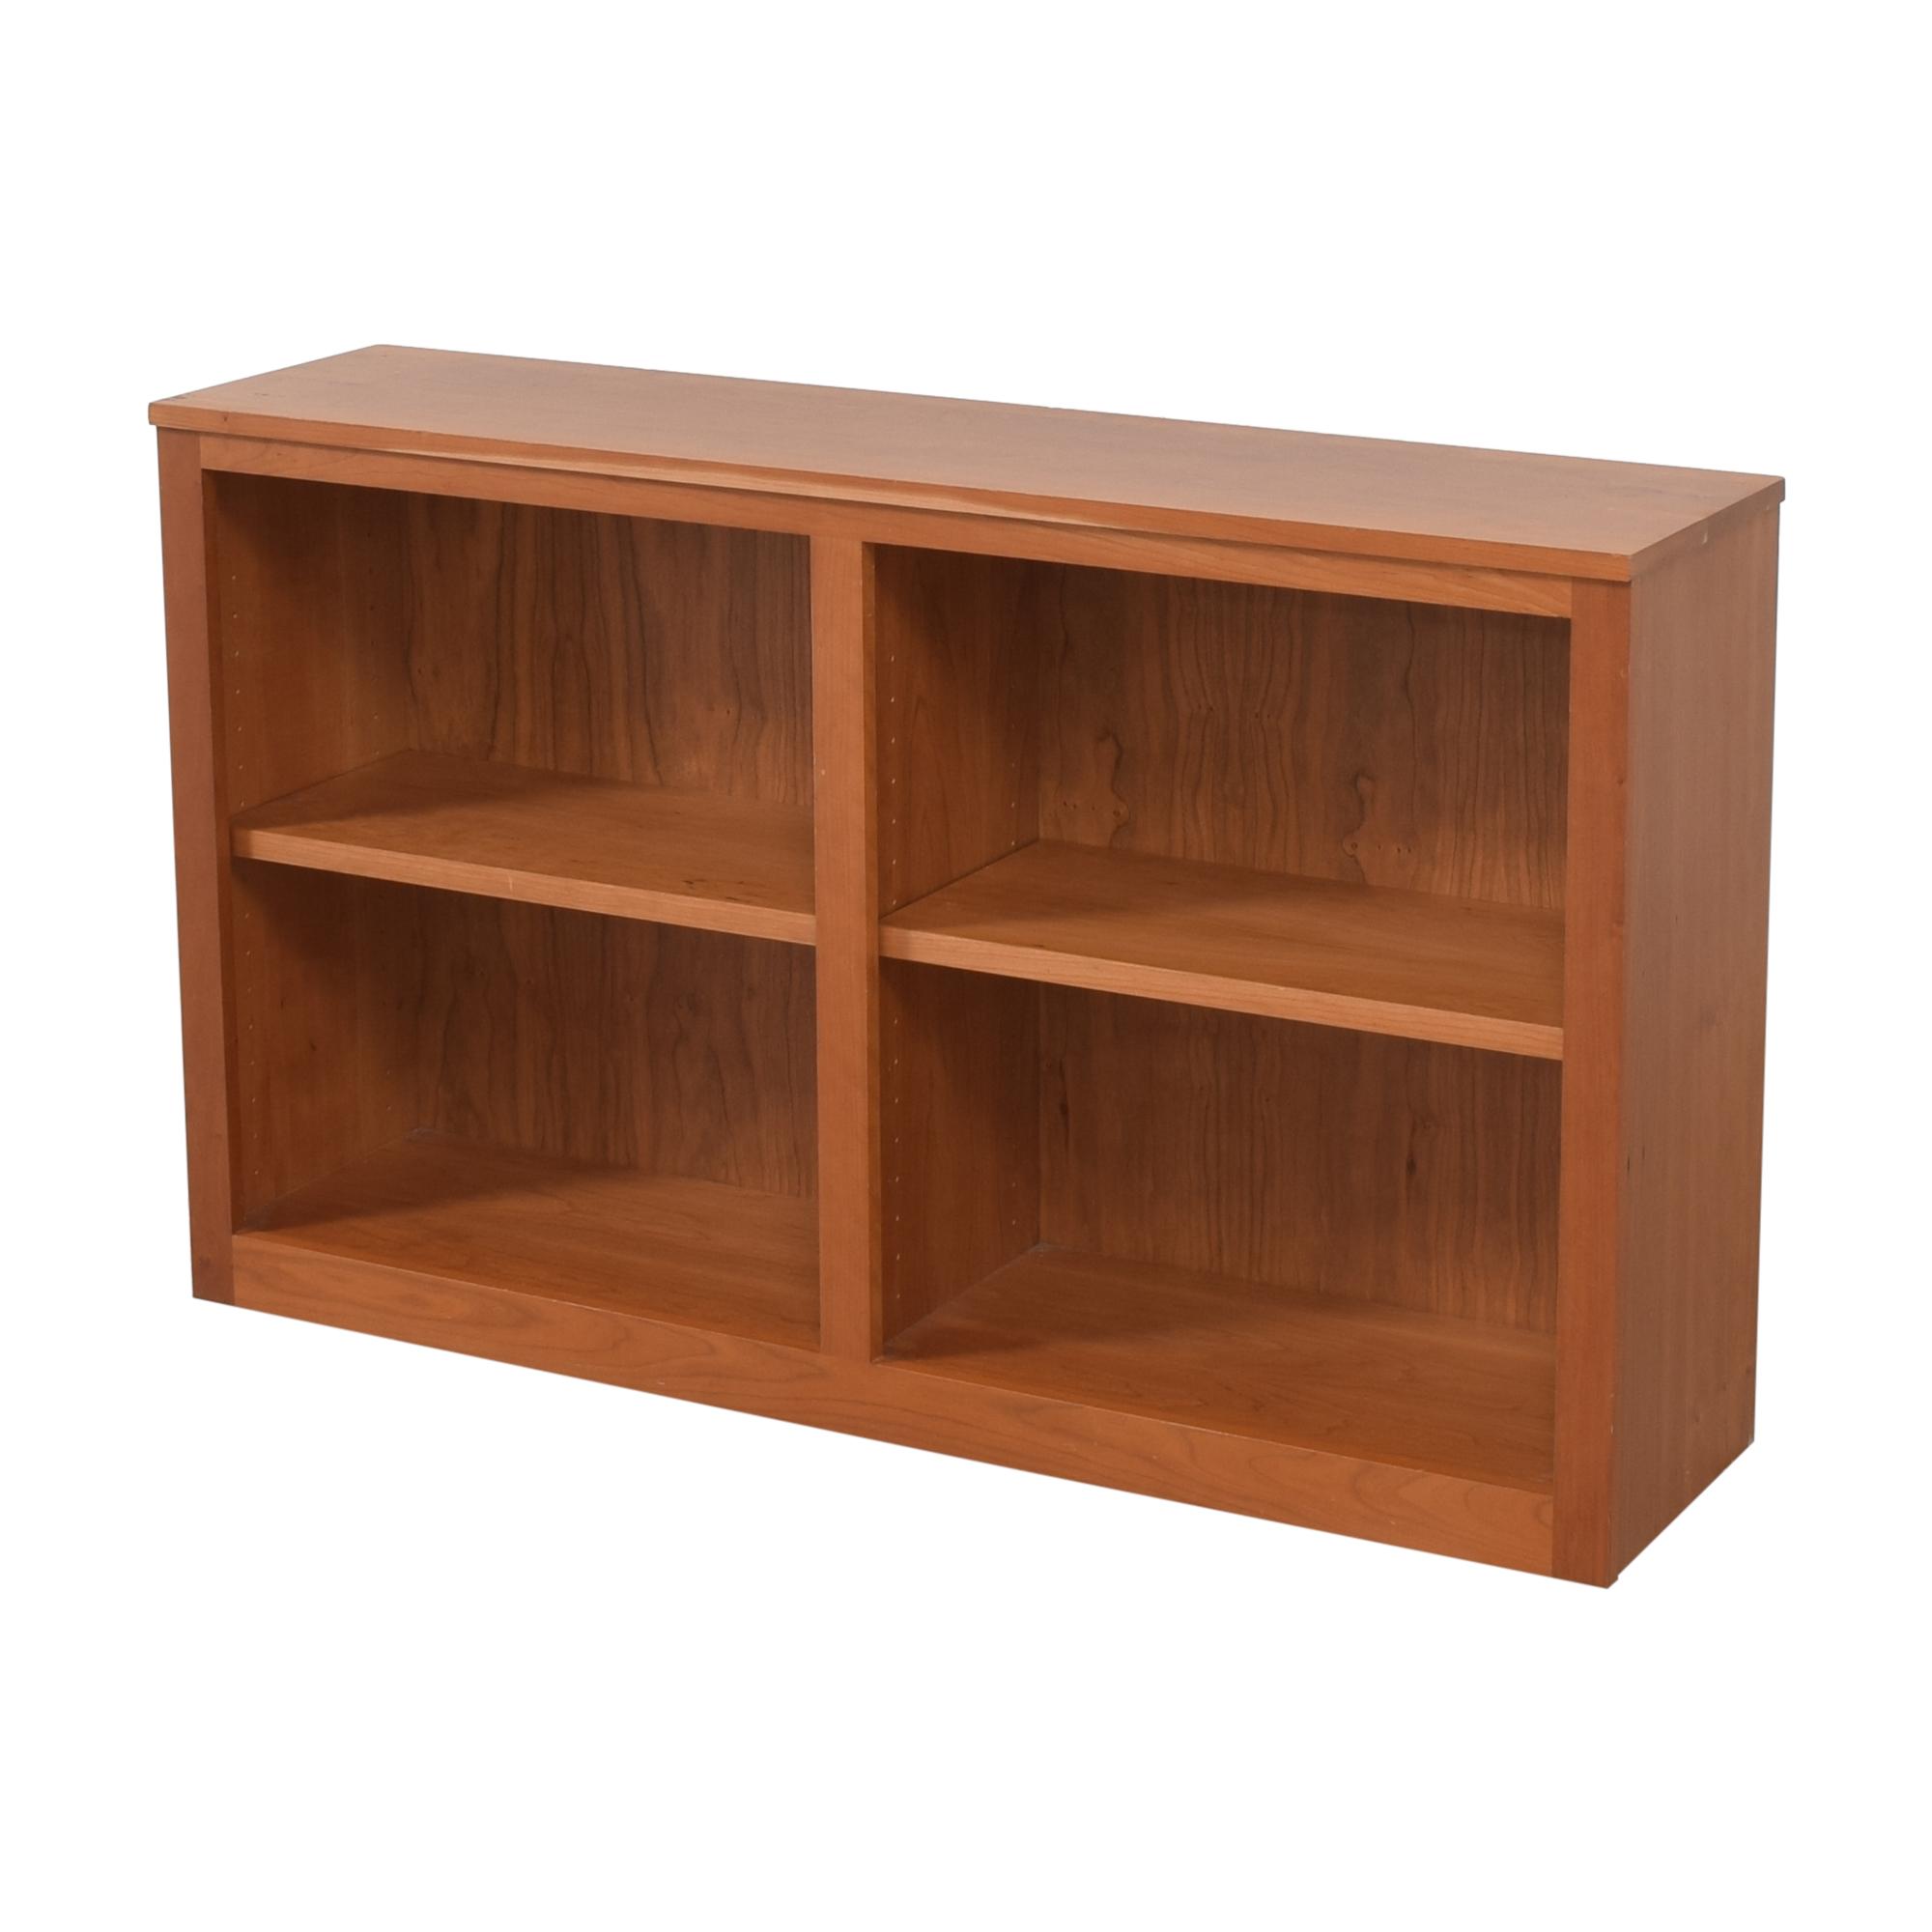 Room & Board Room & Board Woodwind Custom Bookcase ct